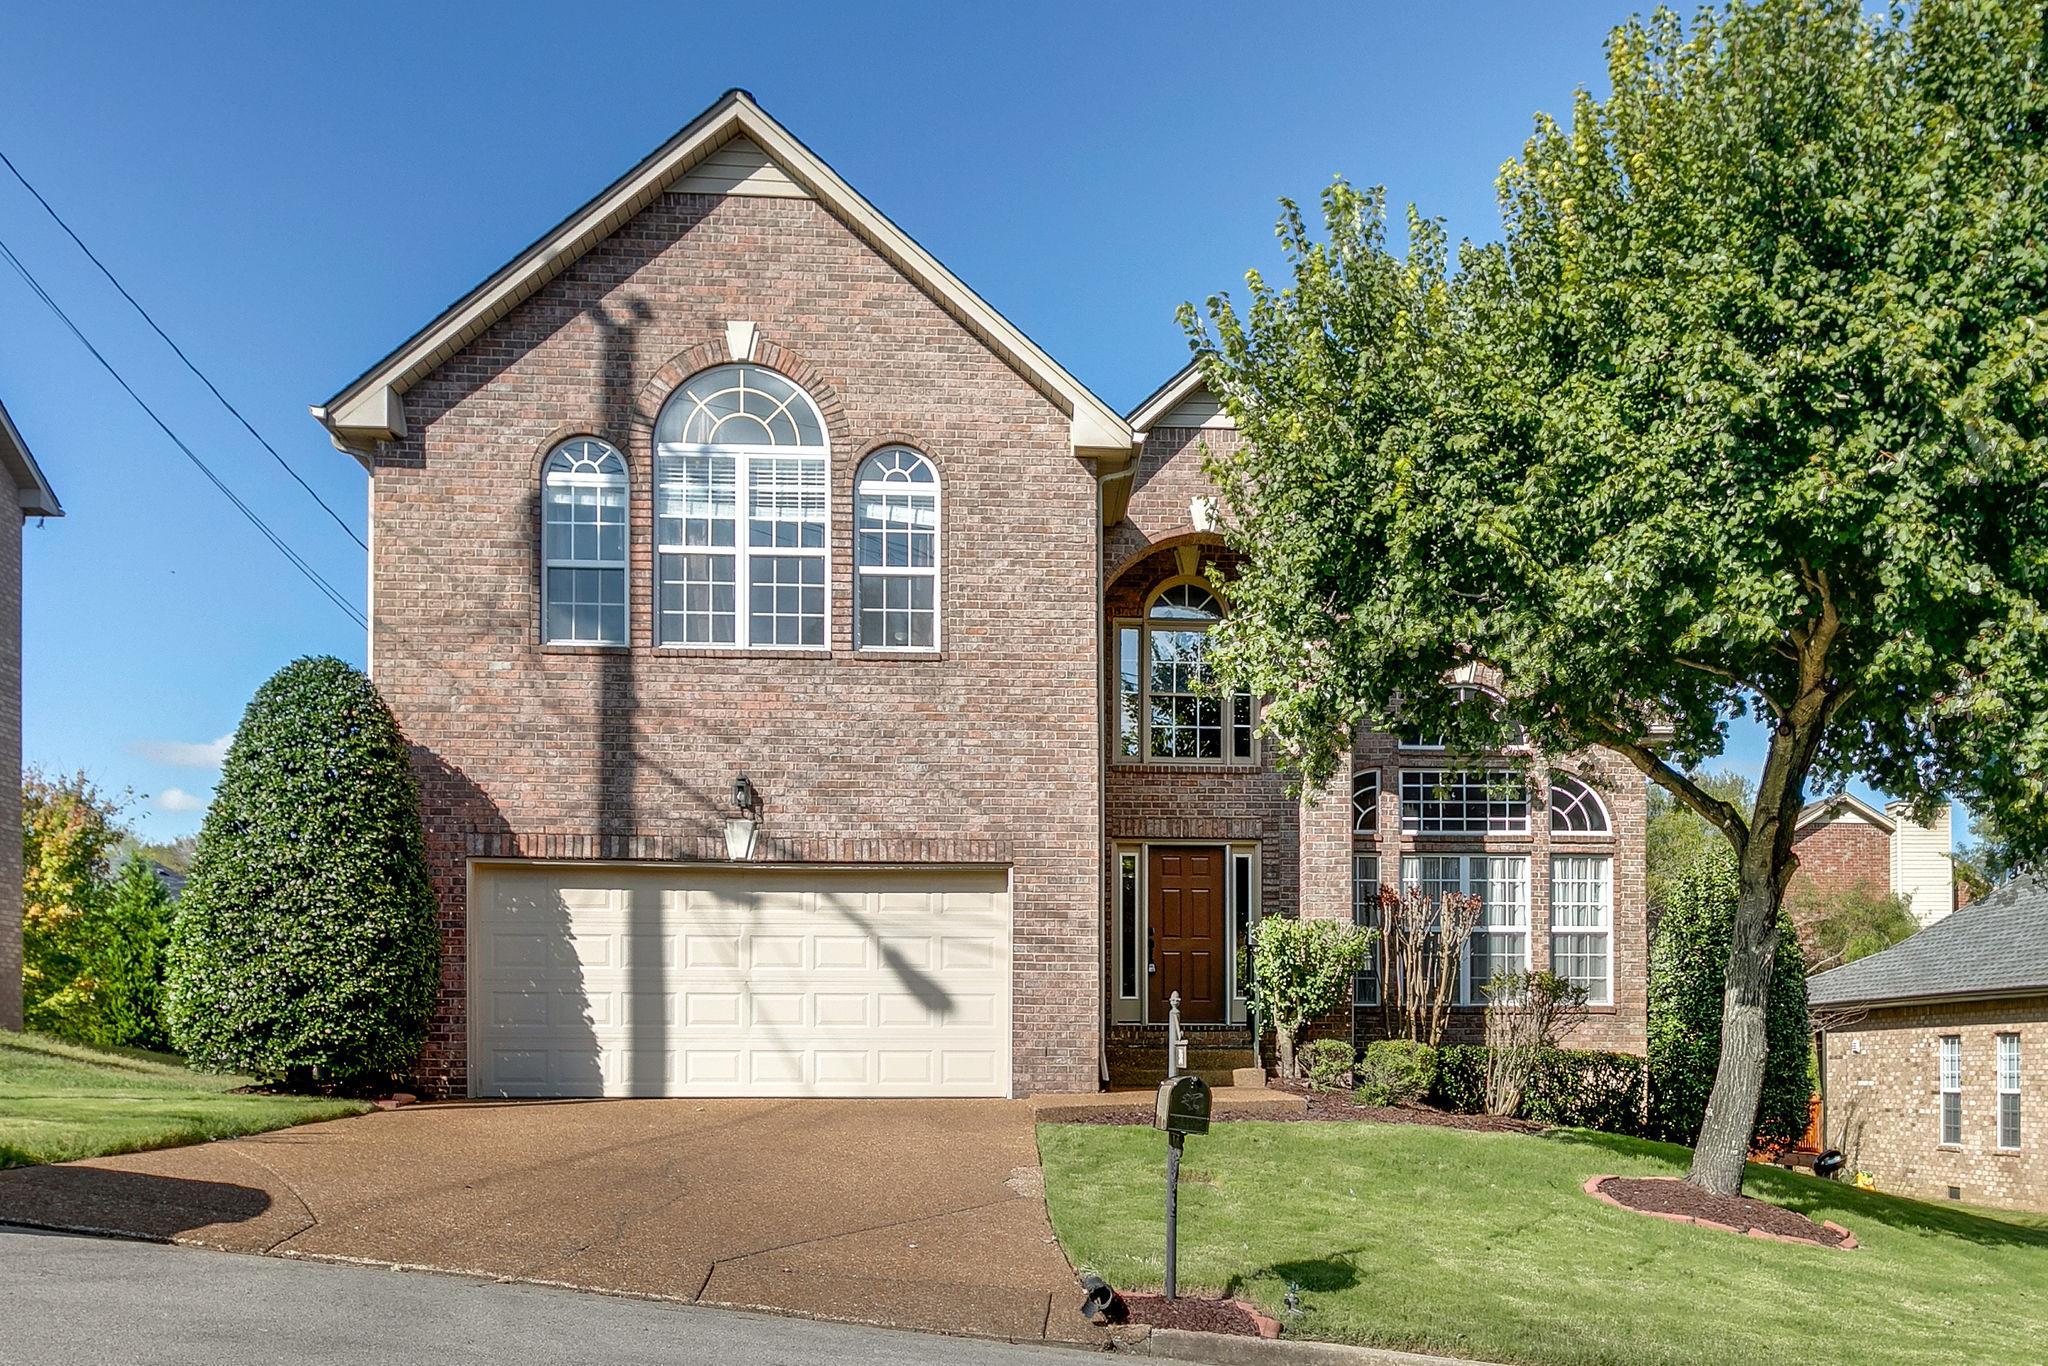 504 Cinnamon Pl, Nashville, TN 37211 - Nashville, TN real estate listing